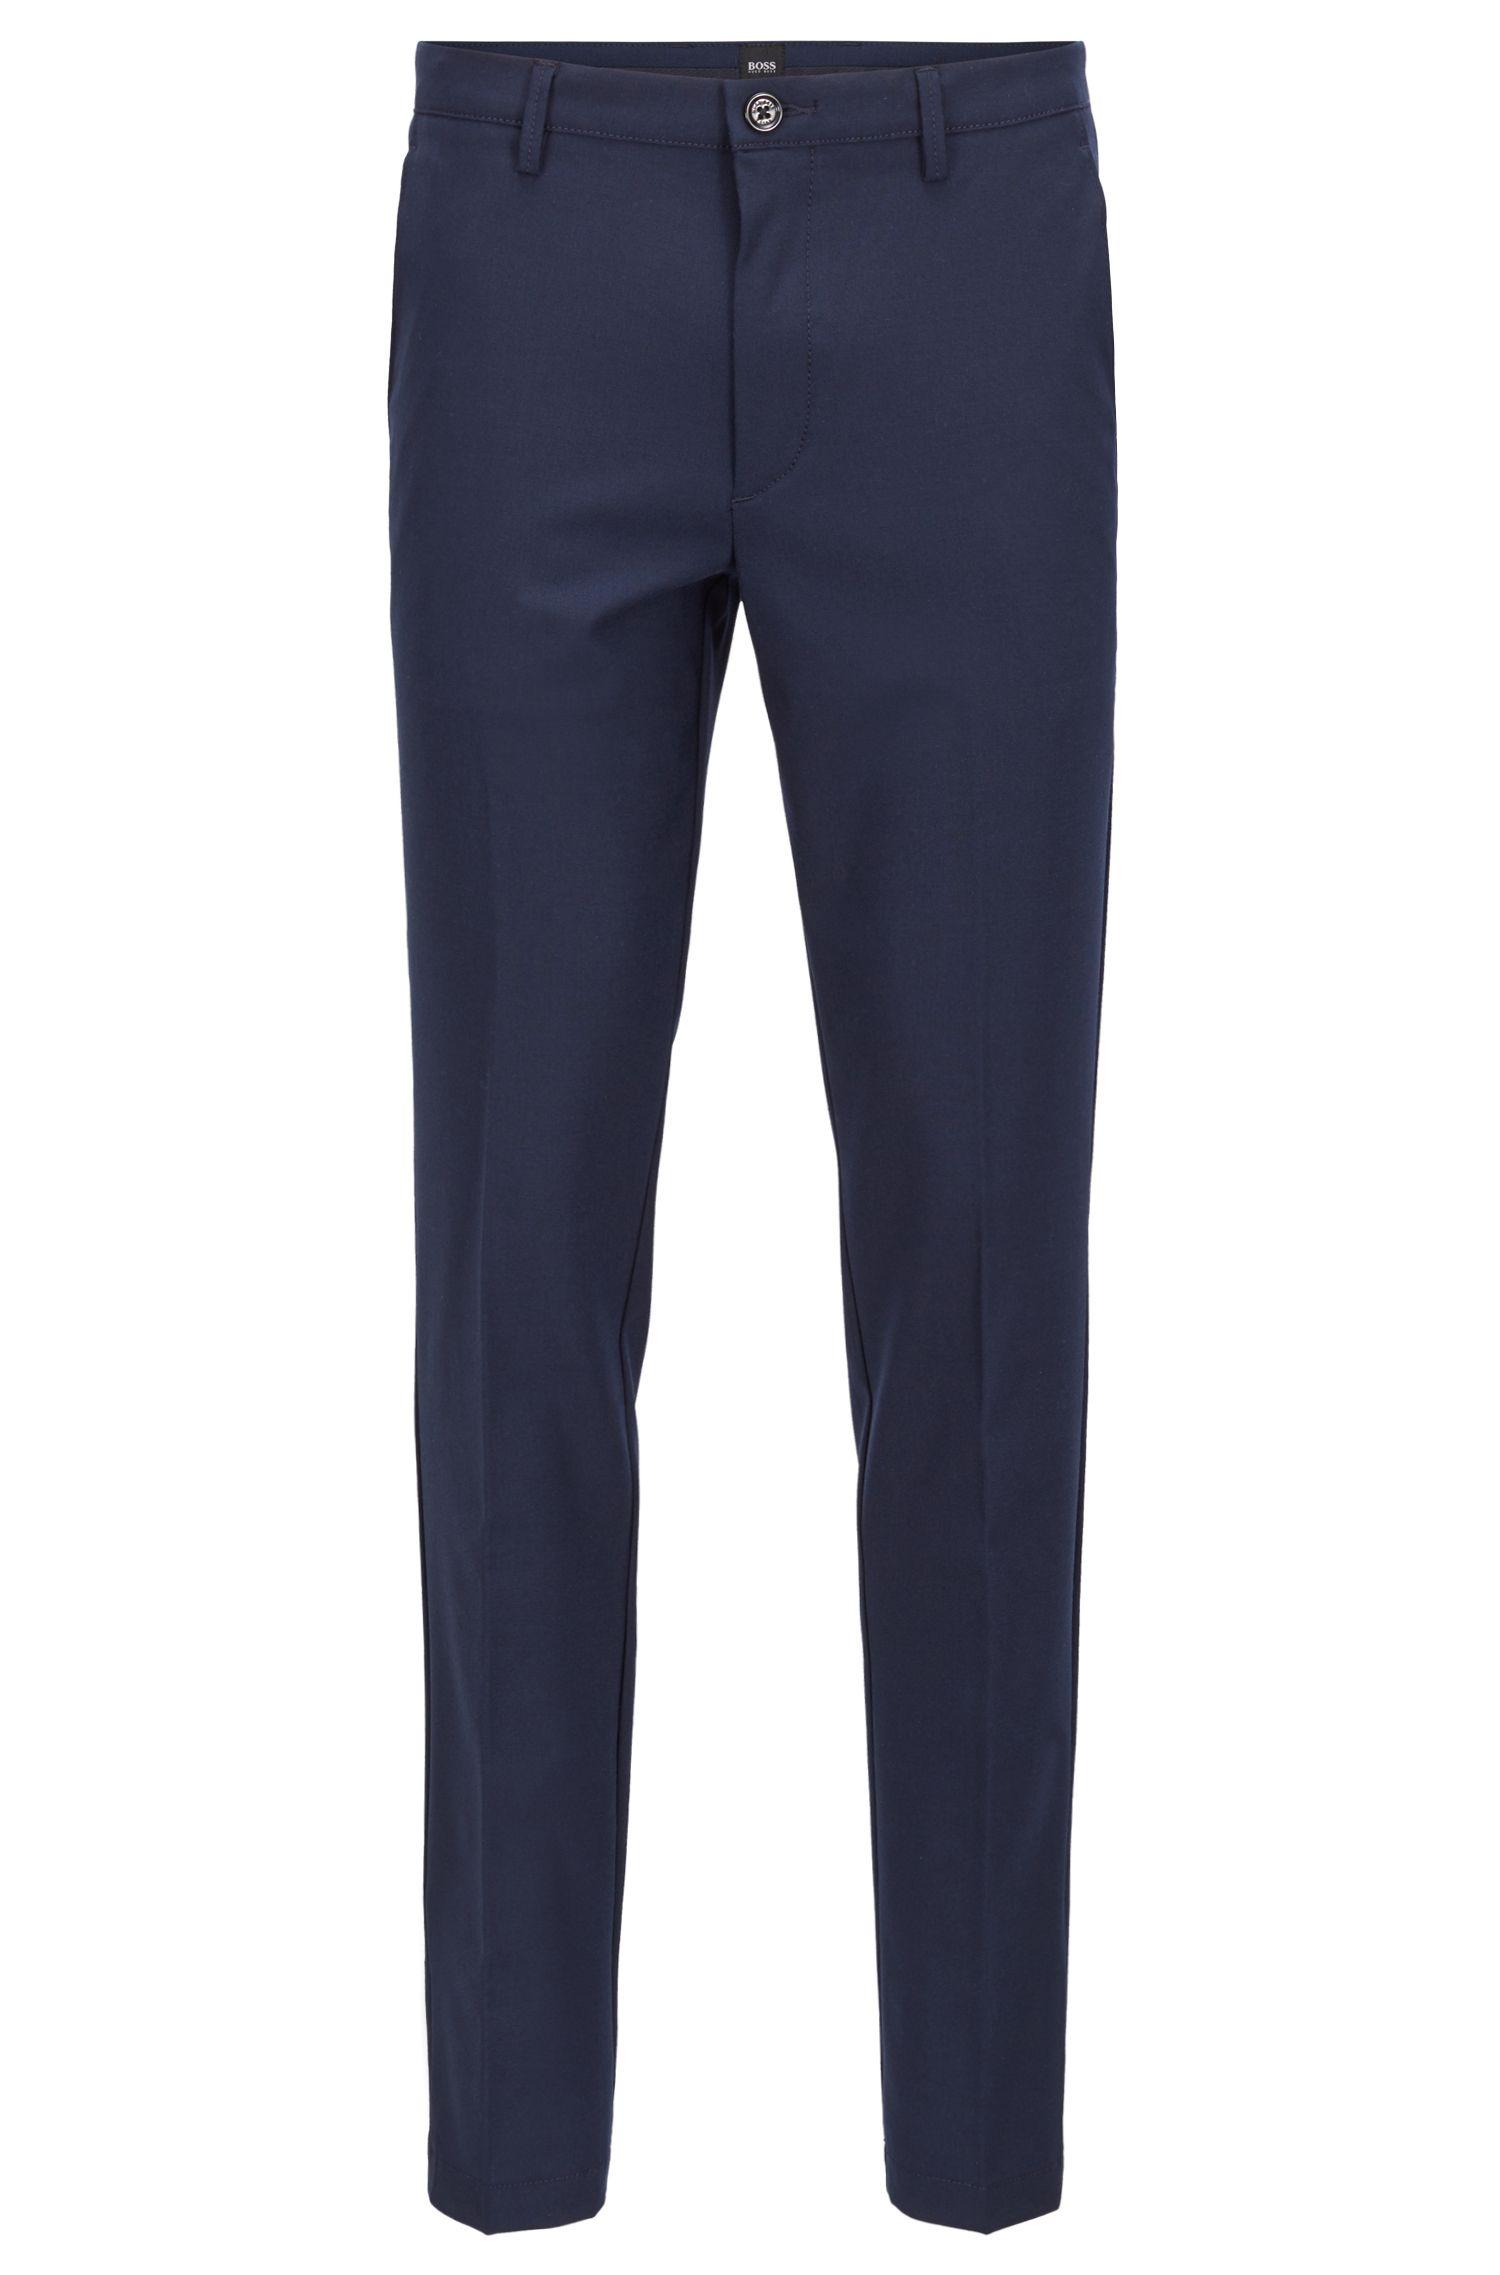 Slim-fit chinos in high-twist mercerized stretch fabric